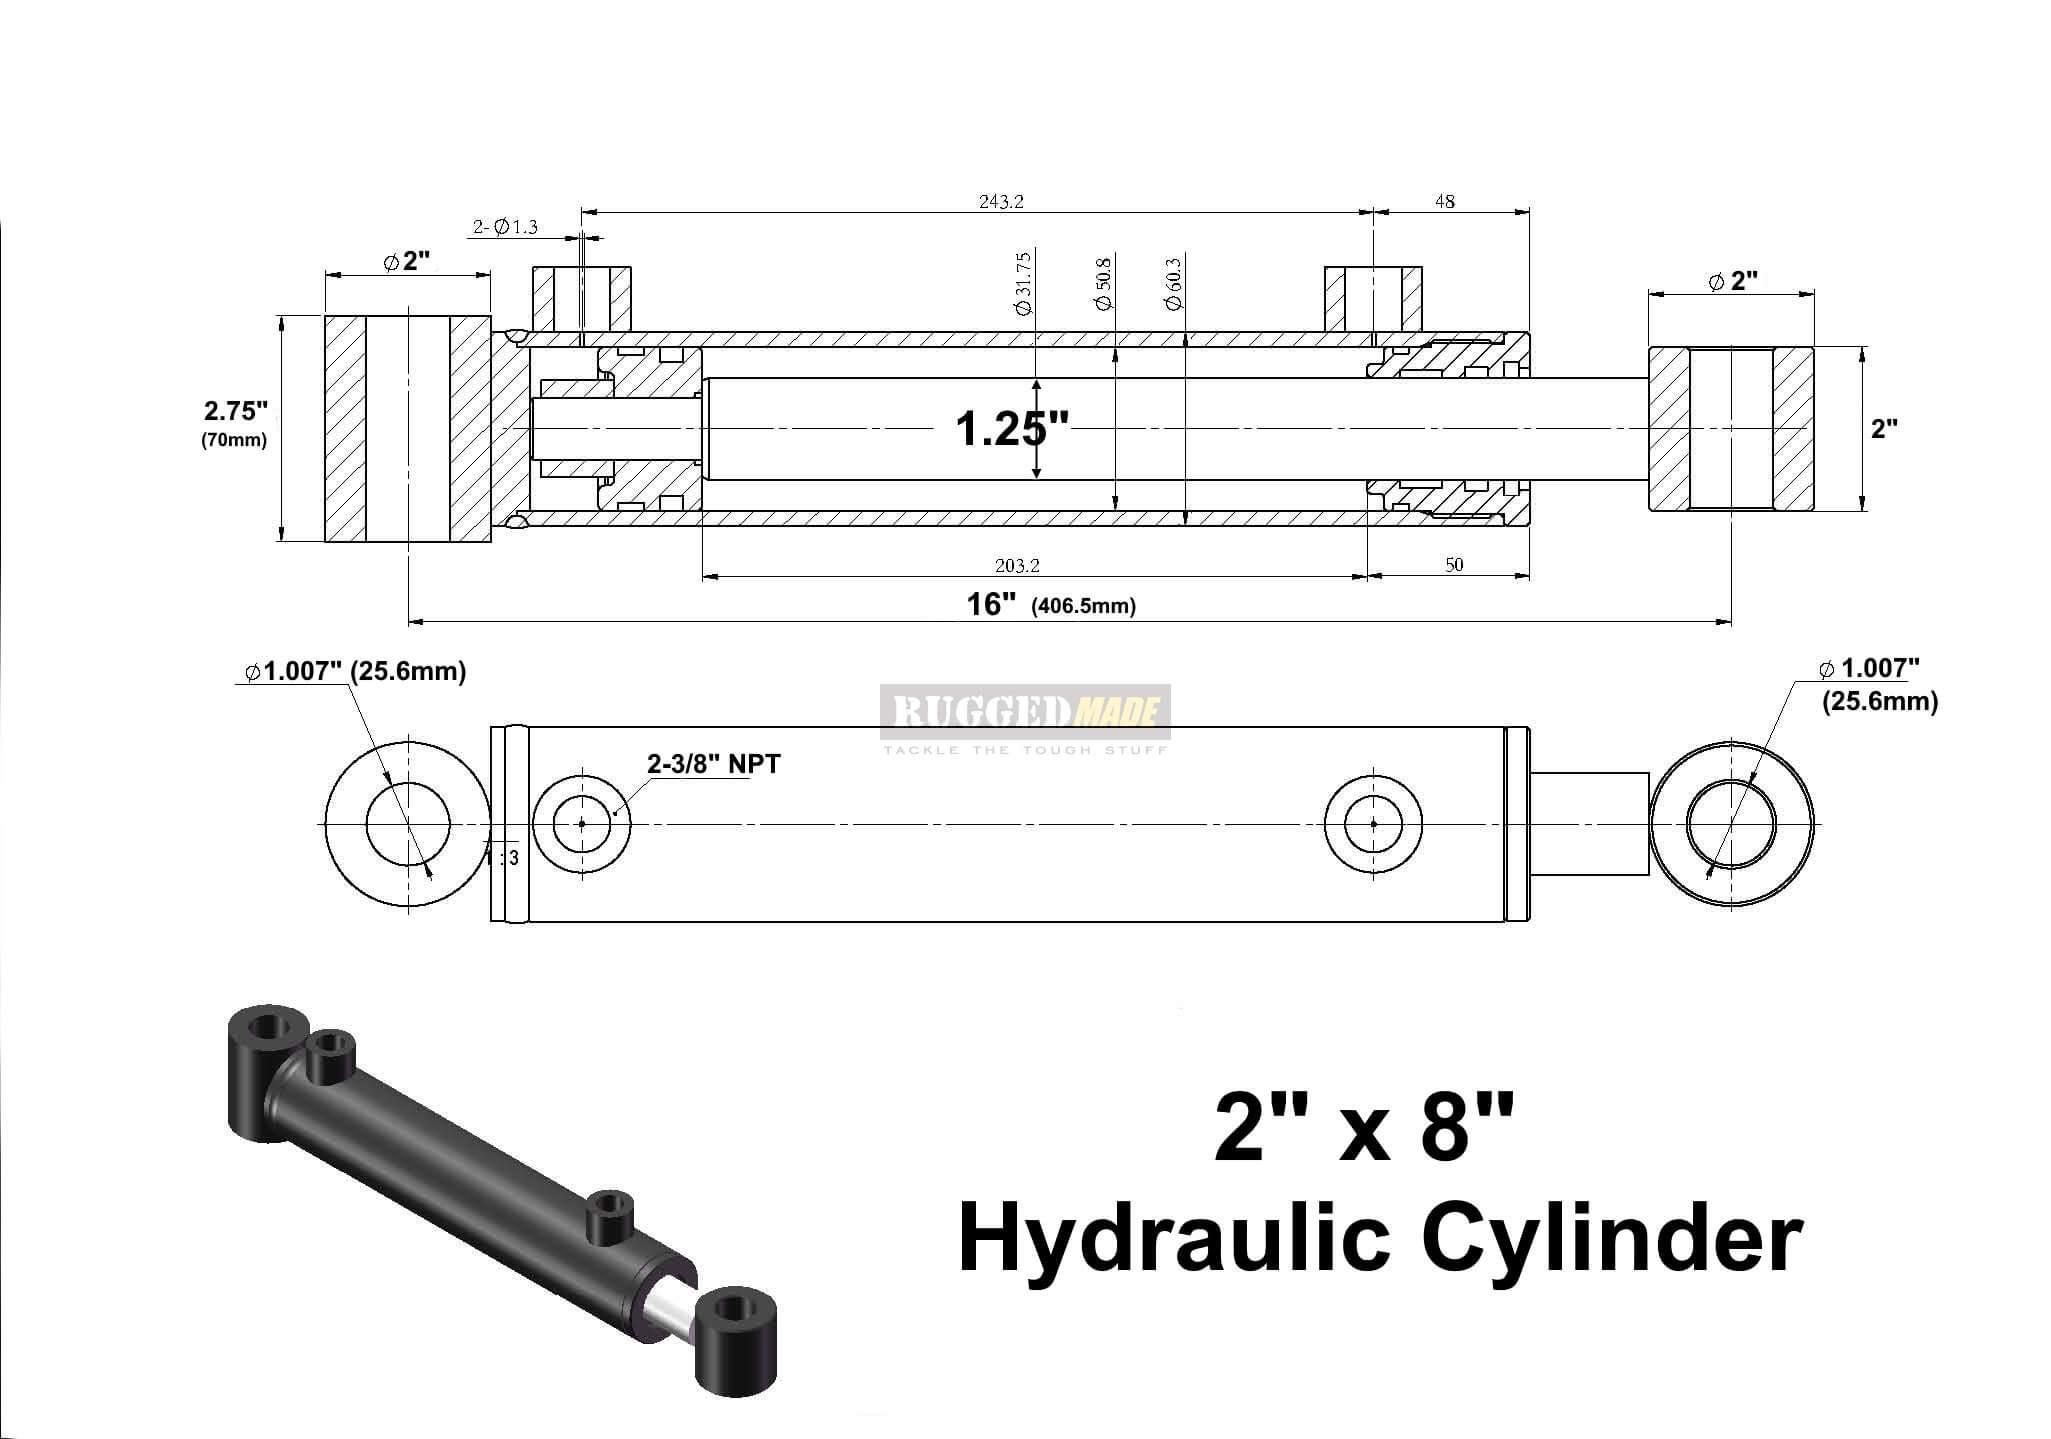 "1 Cylinder Engine Diagram Welded Log Lift Cylinder 3 8"" Work Ports 2"" Id X 8"" Stroke X 1 25 Of 1 Cylinder Engine Diagram"